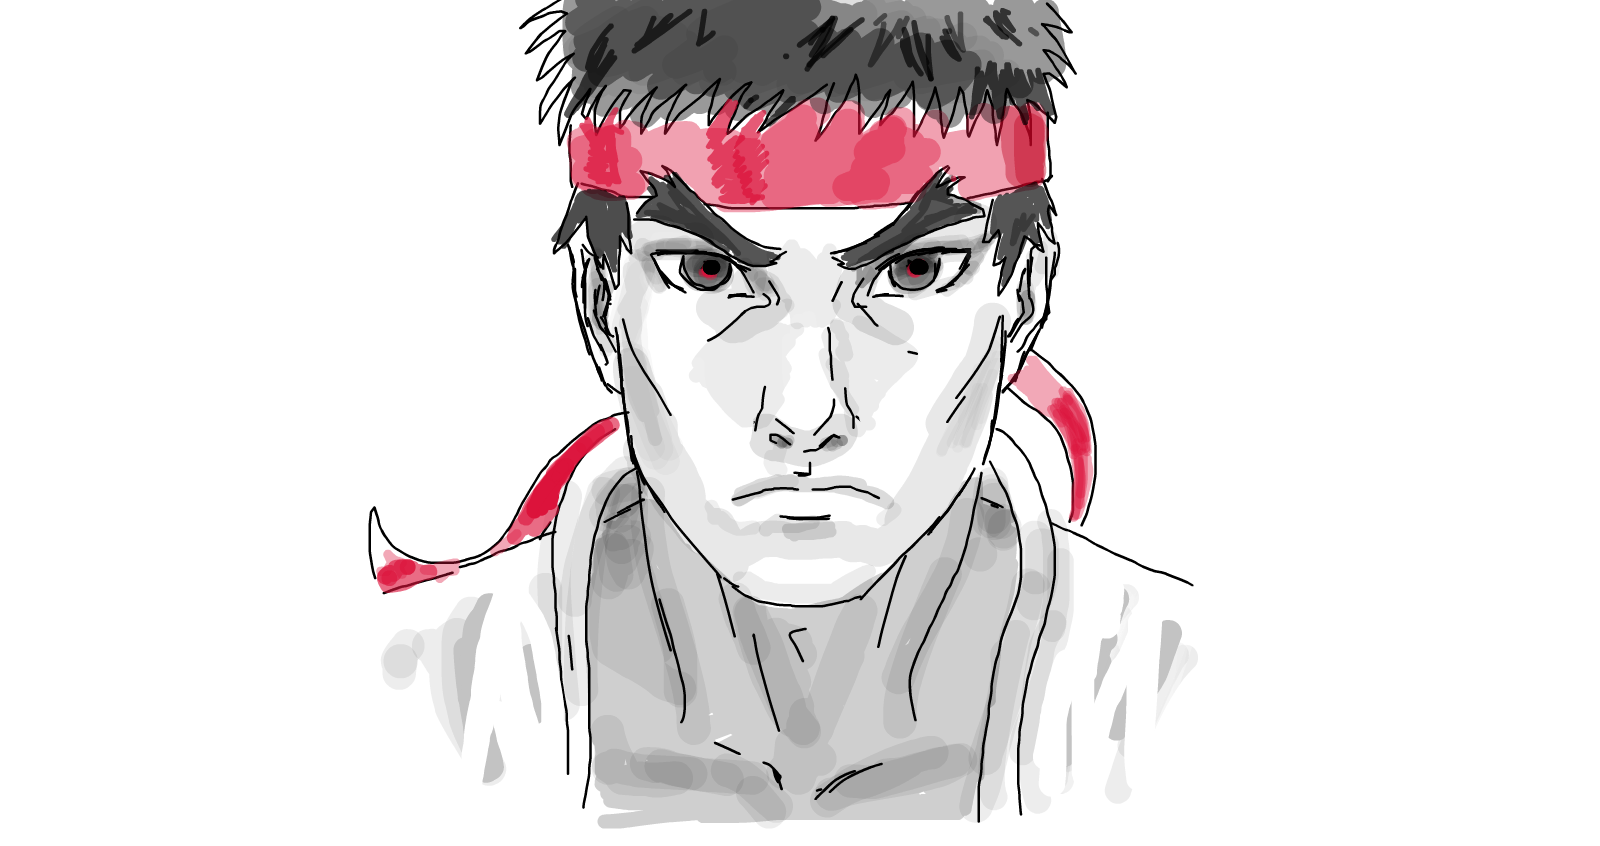 Ryu Drawings Sketchport